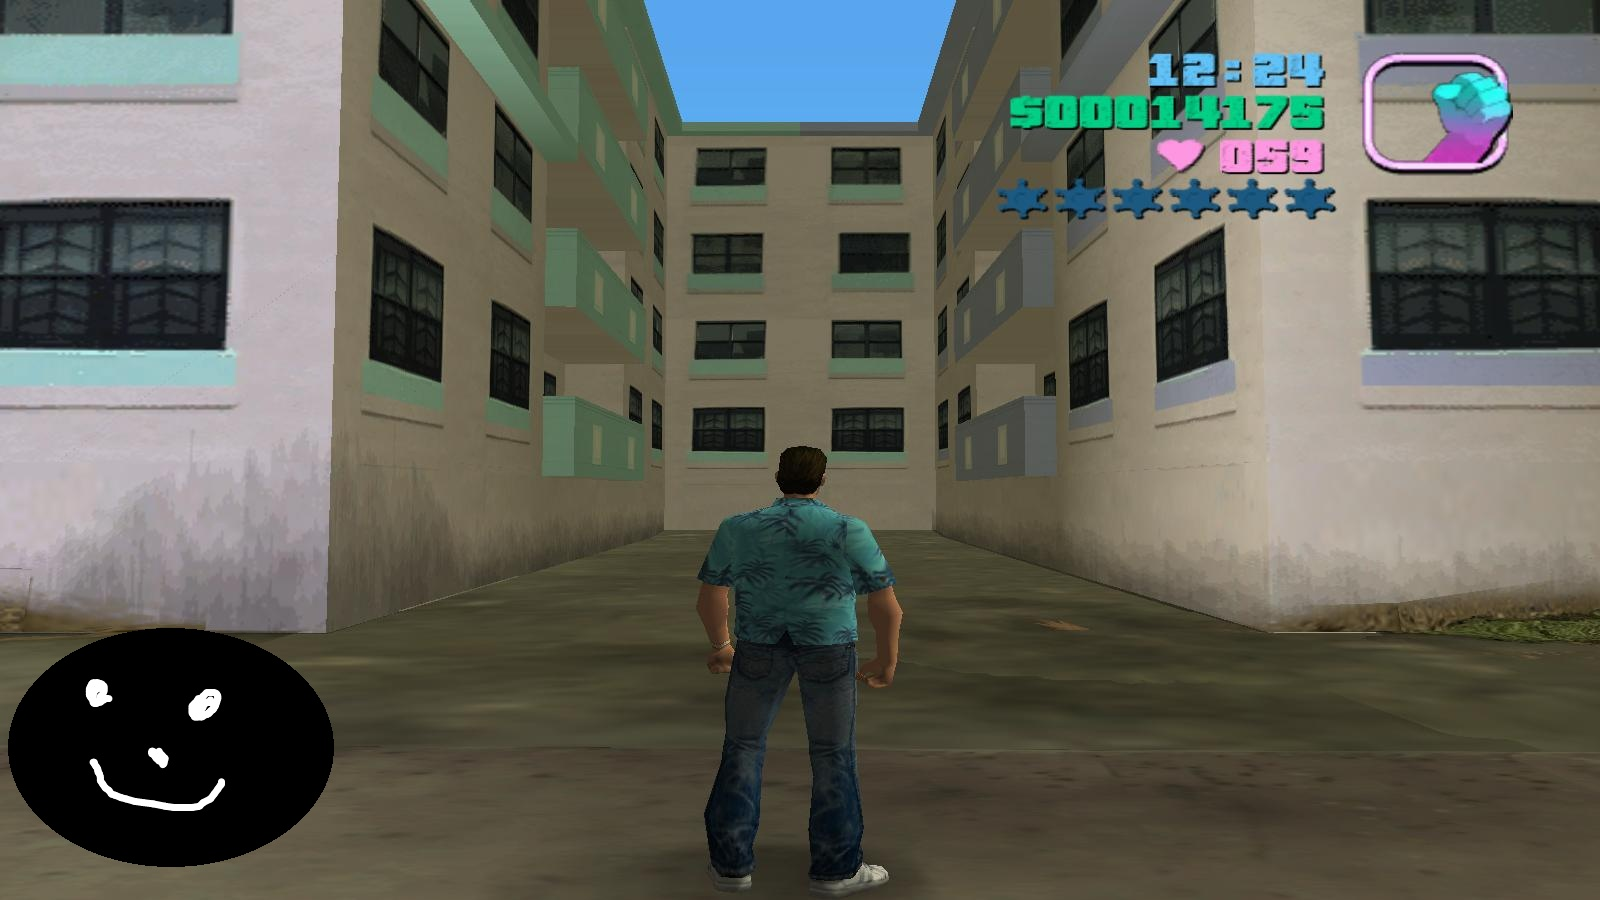 4 - Grand Theft Auto: Vice City